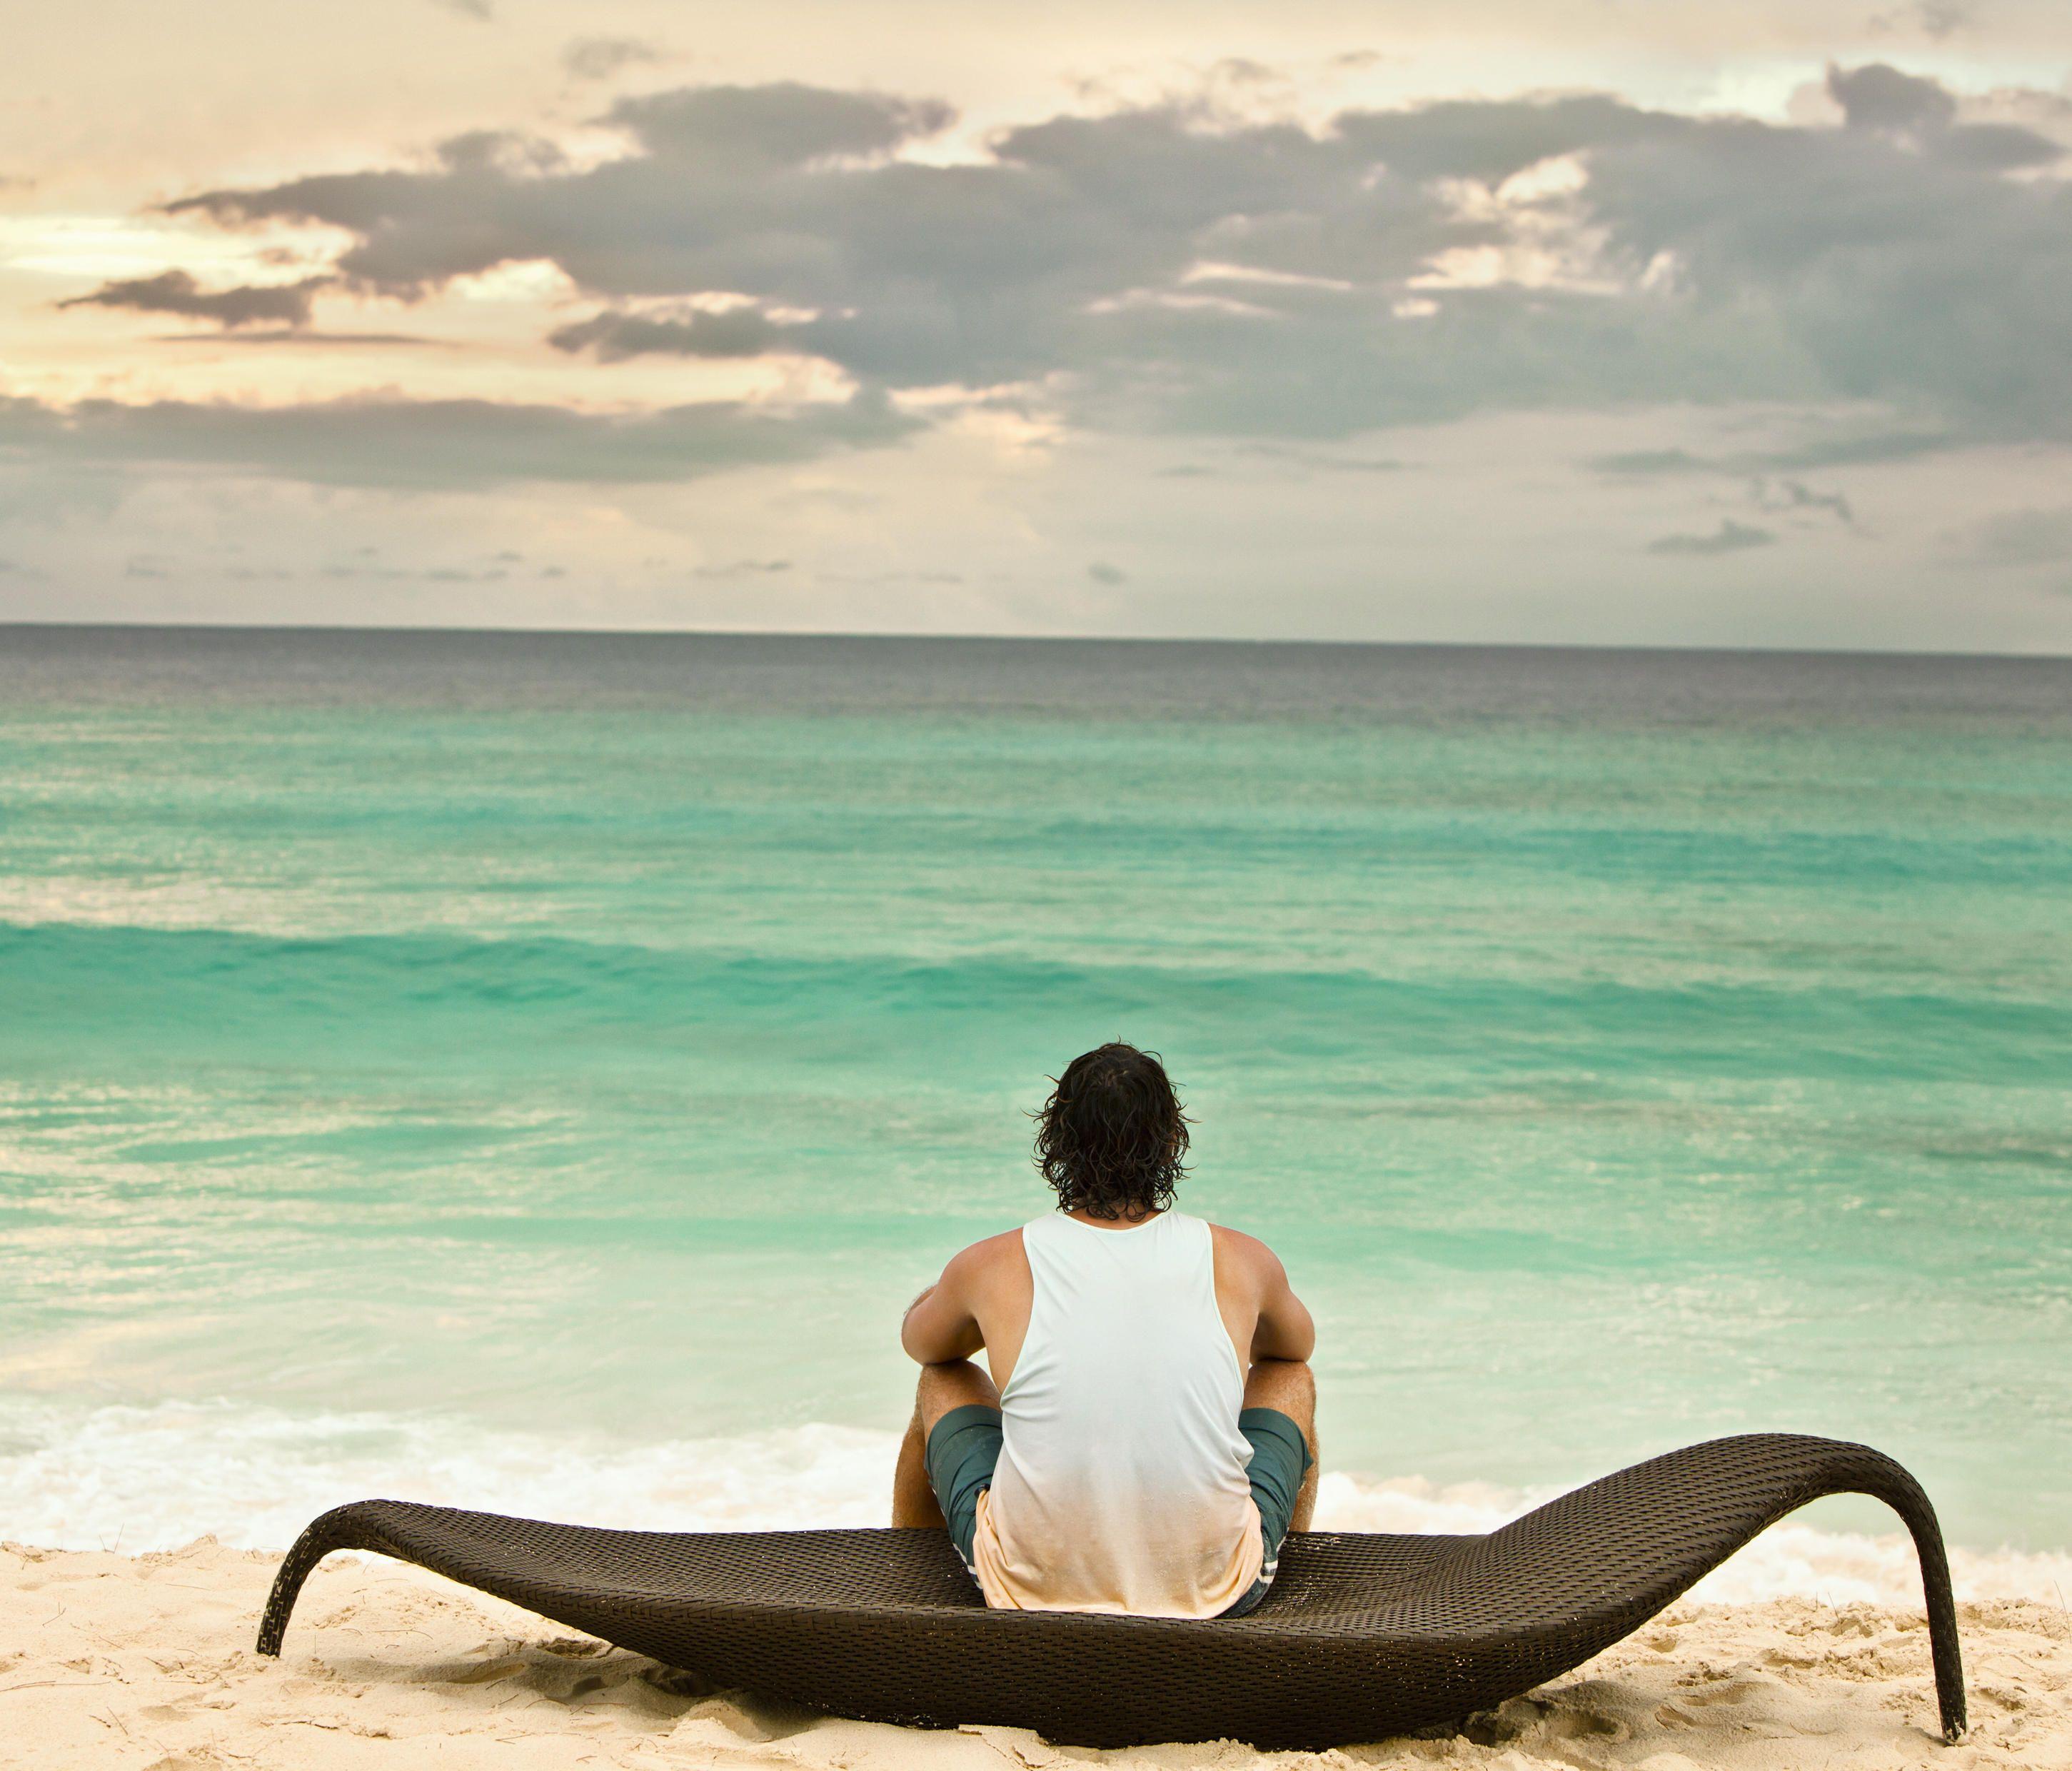 Leaf beach chair xxl designer sun loungers from dedon all